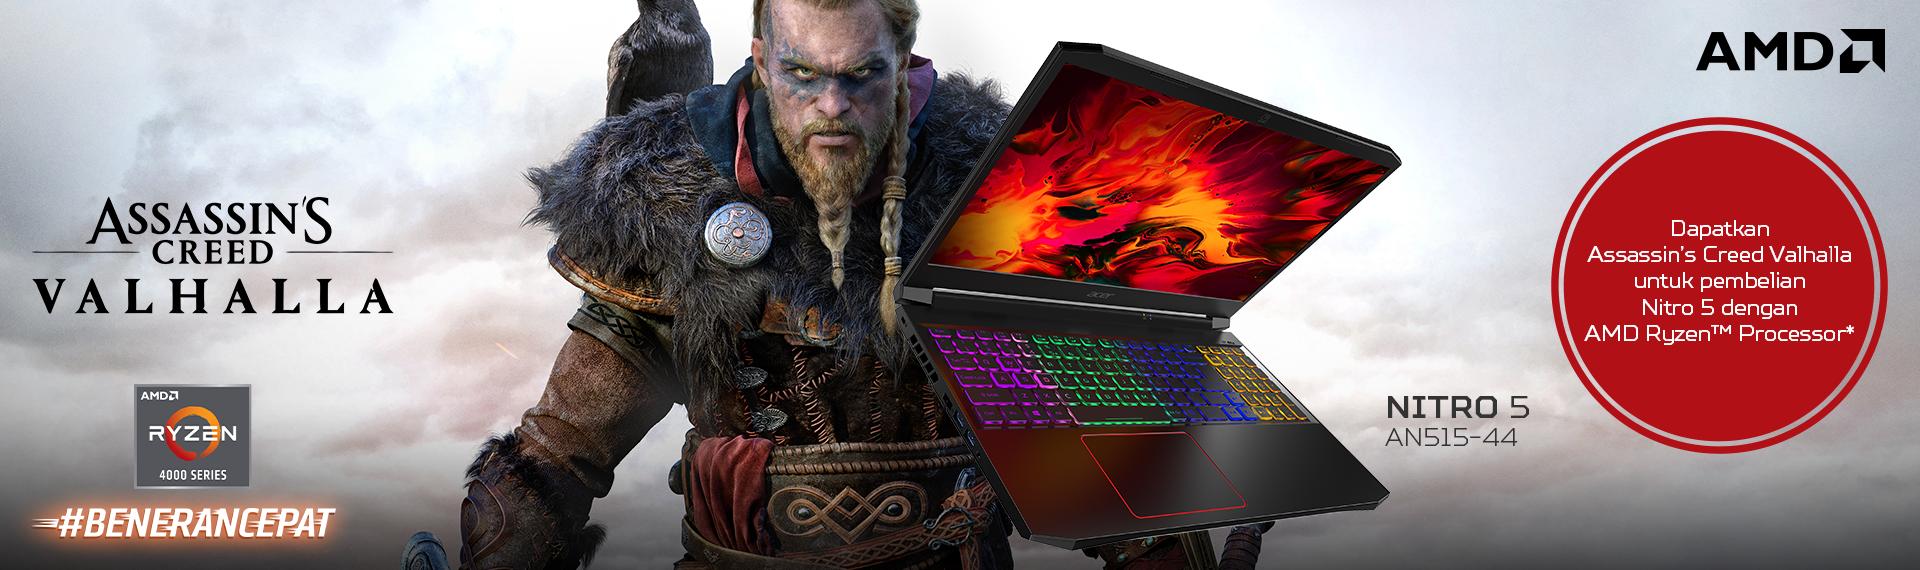 Beli Laptop Nitro 5 Ryzen 4000 dan Dapatkan Free Assassin's Creed® Valhalla!